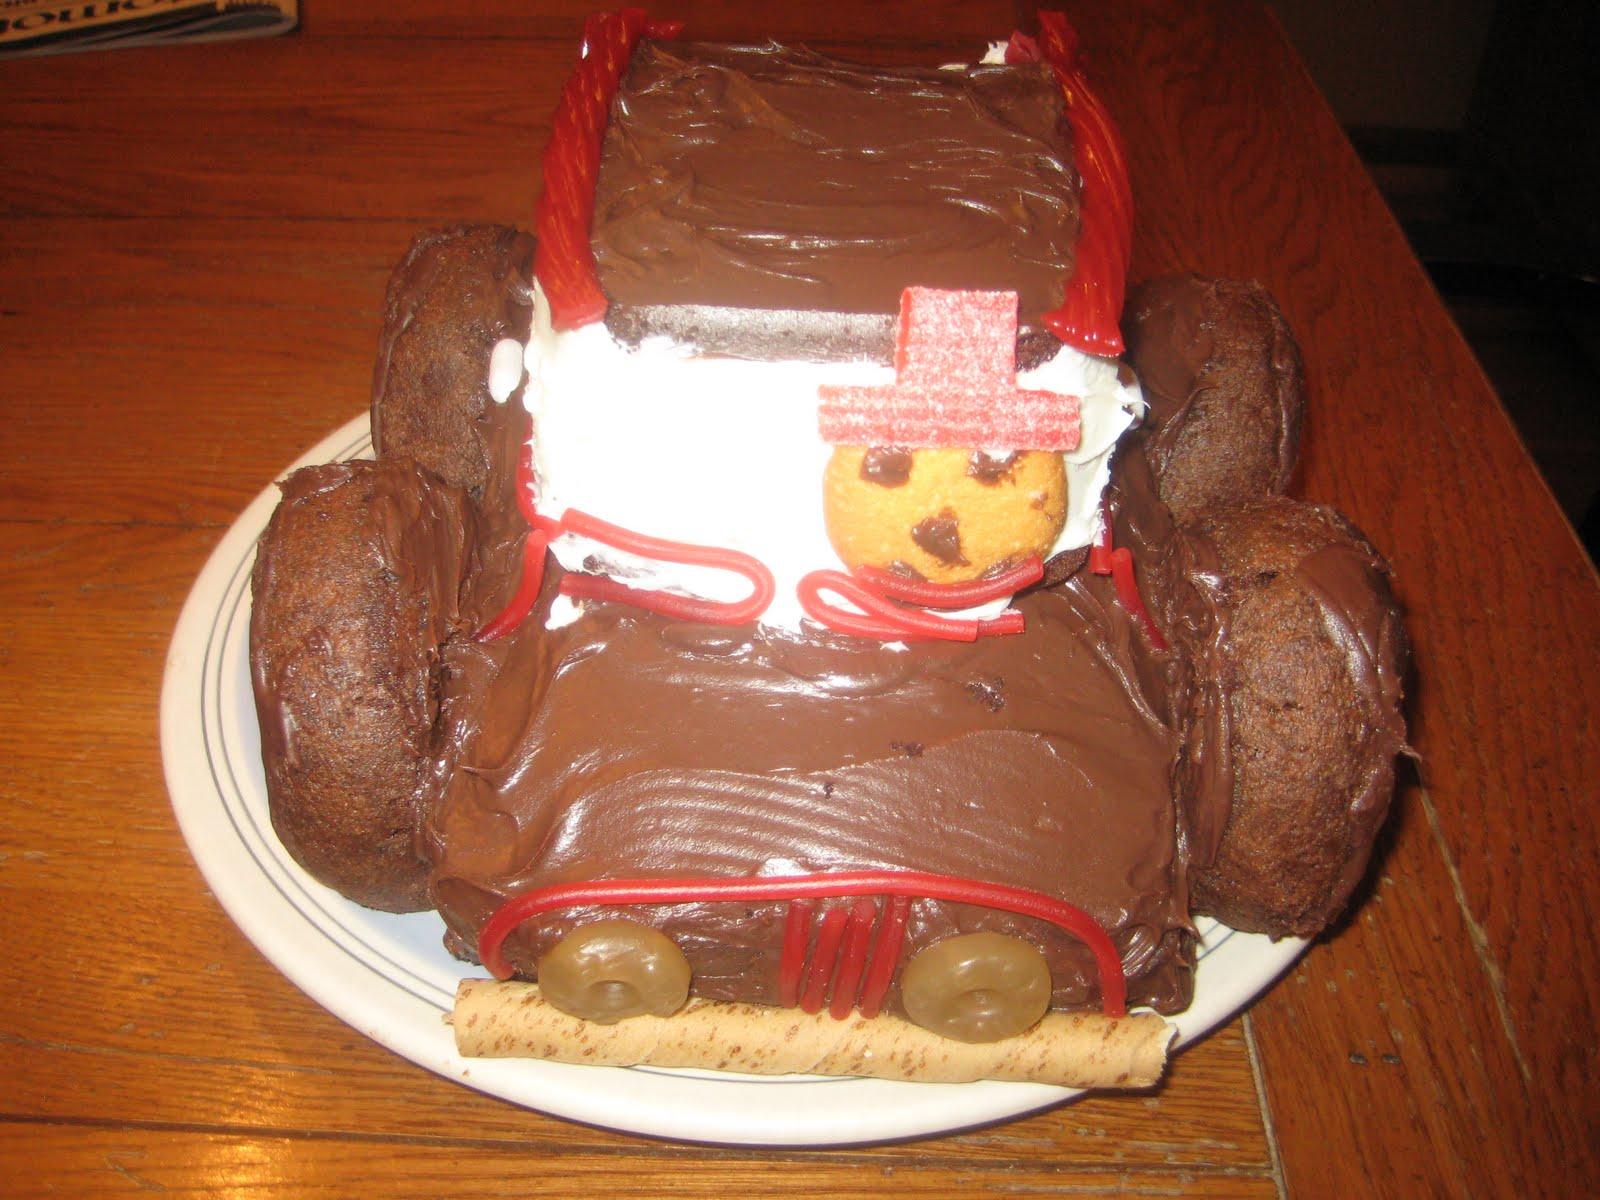 Jeep Wrangler Birthday Cake Ideas and Designs